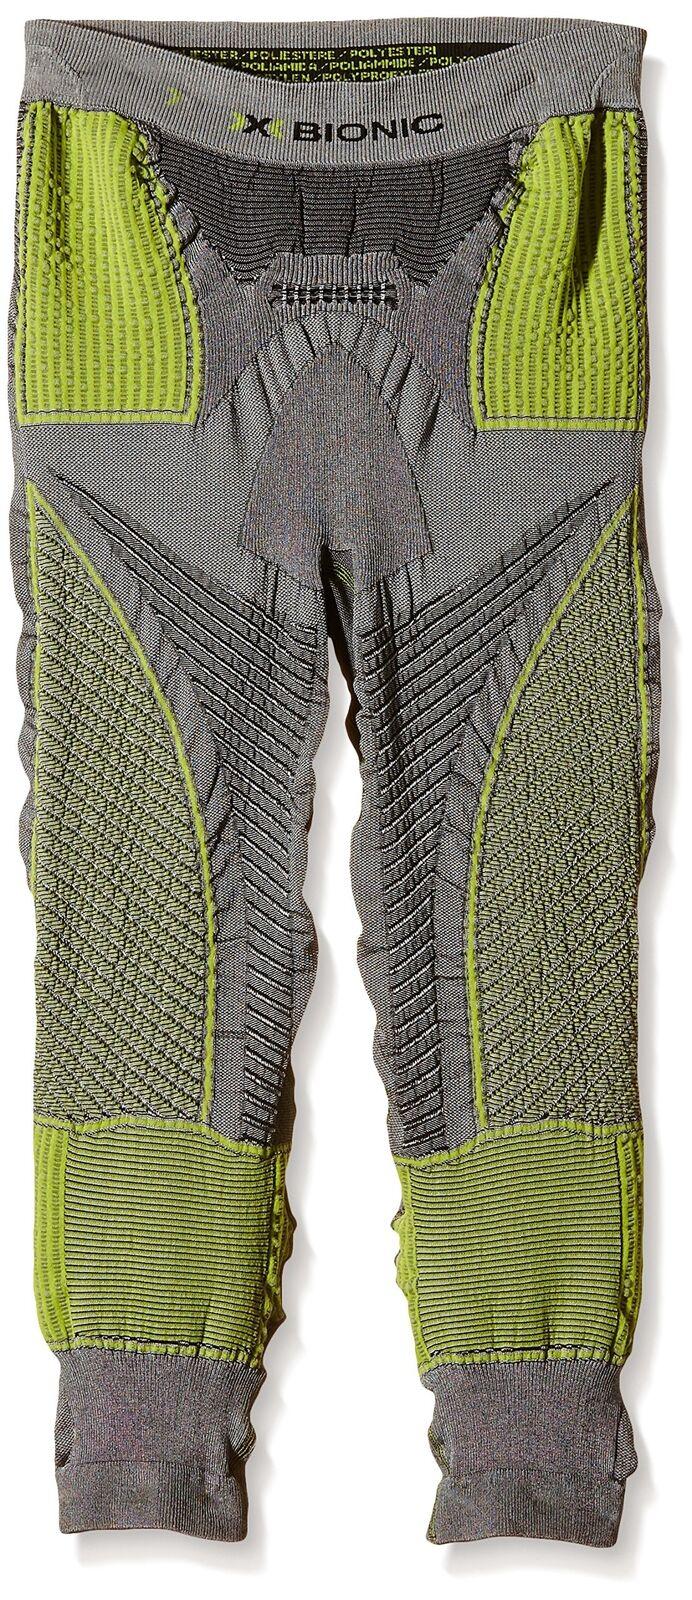 X-Bionic Men's Radiactor Evo 3 4 Length  Base Layer Trousers Iron Yellow S M  factory direct sales